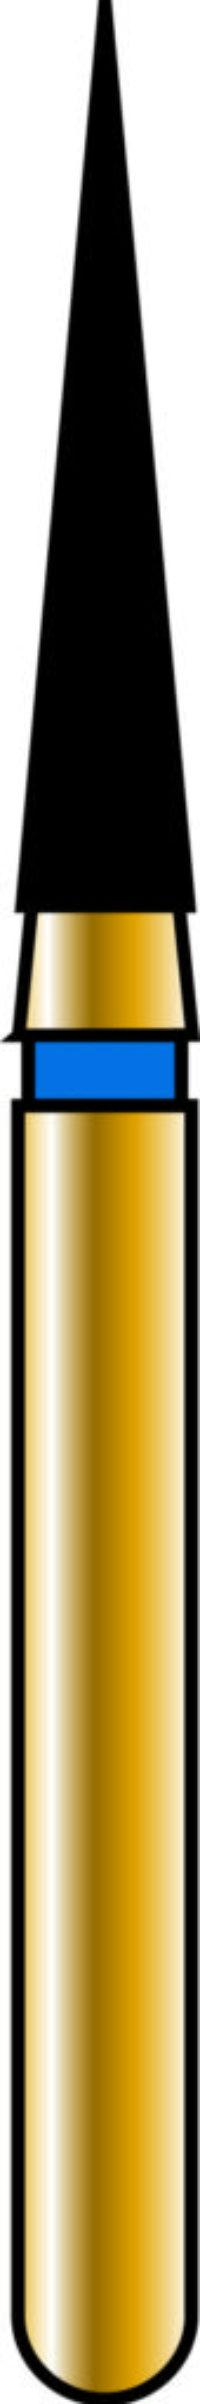 Flame 16-8mm Gold Diamond Bur - Coarse Grit